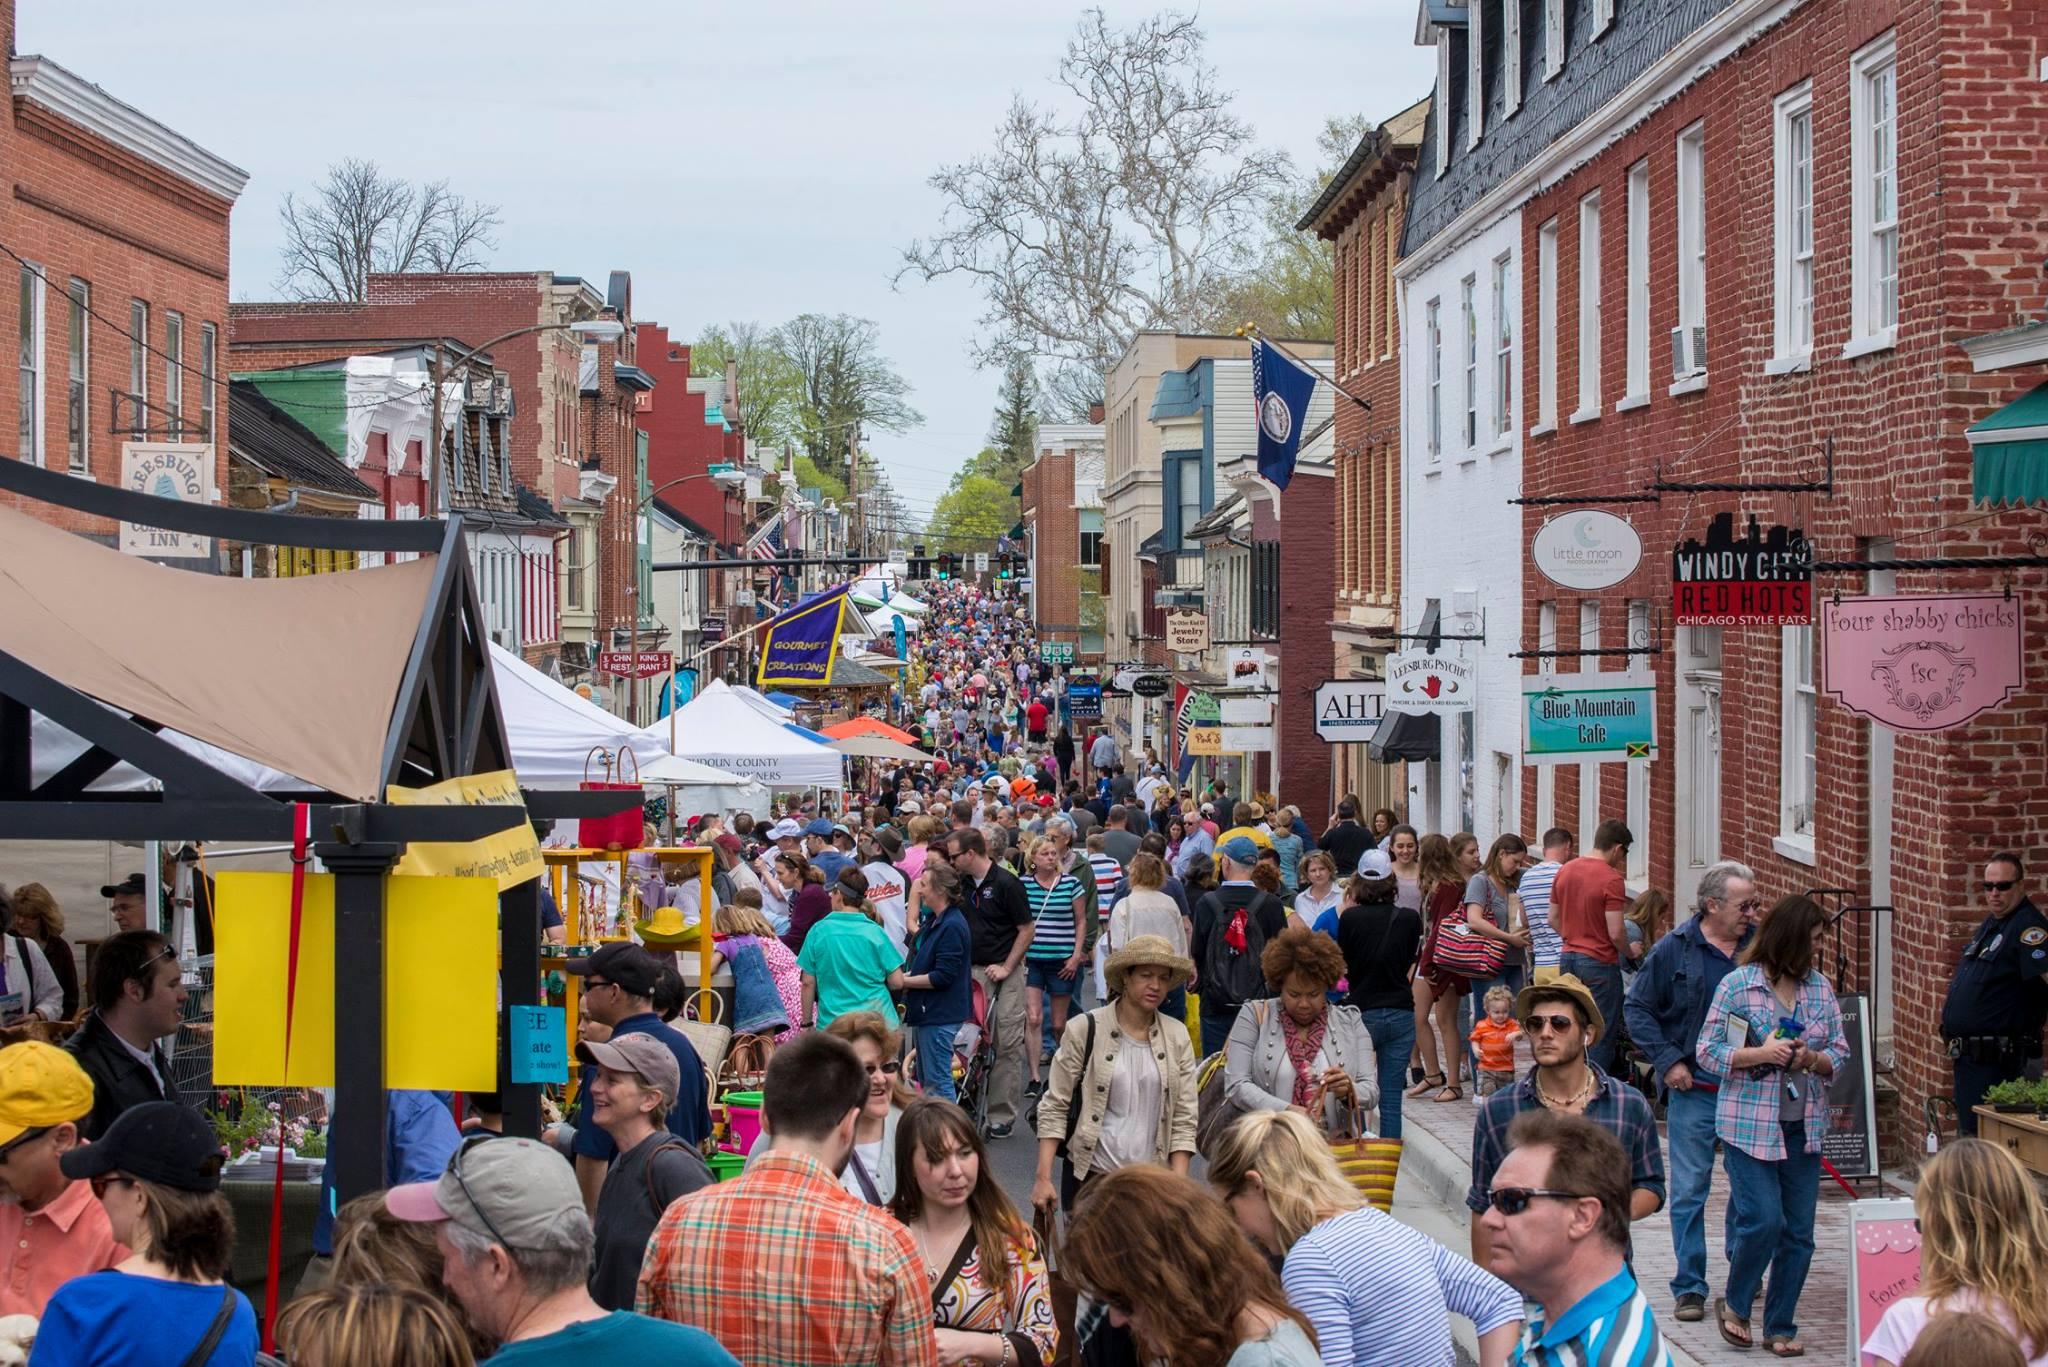 13 best small towns festivals near washington dc - Leesburg flower and garden festival 2017 ...